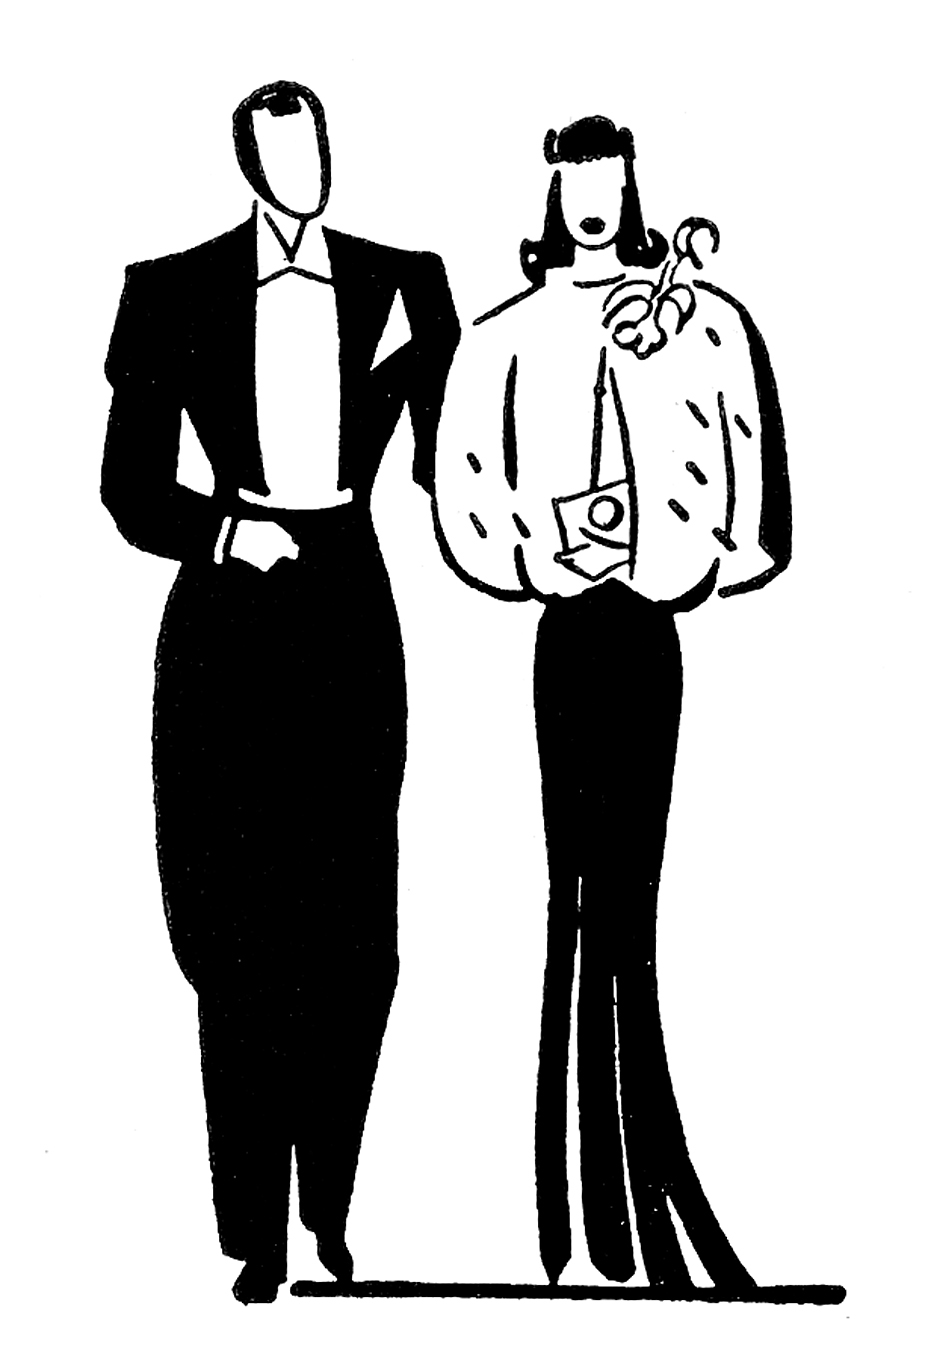 Free download Clip Art Couples Line Art png. - CleanPNG / KissPNG